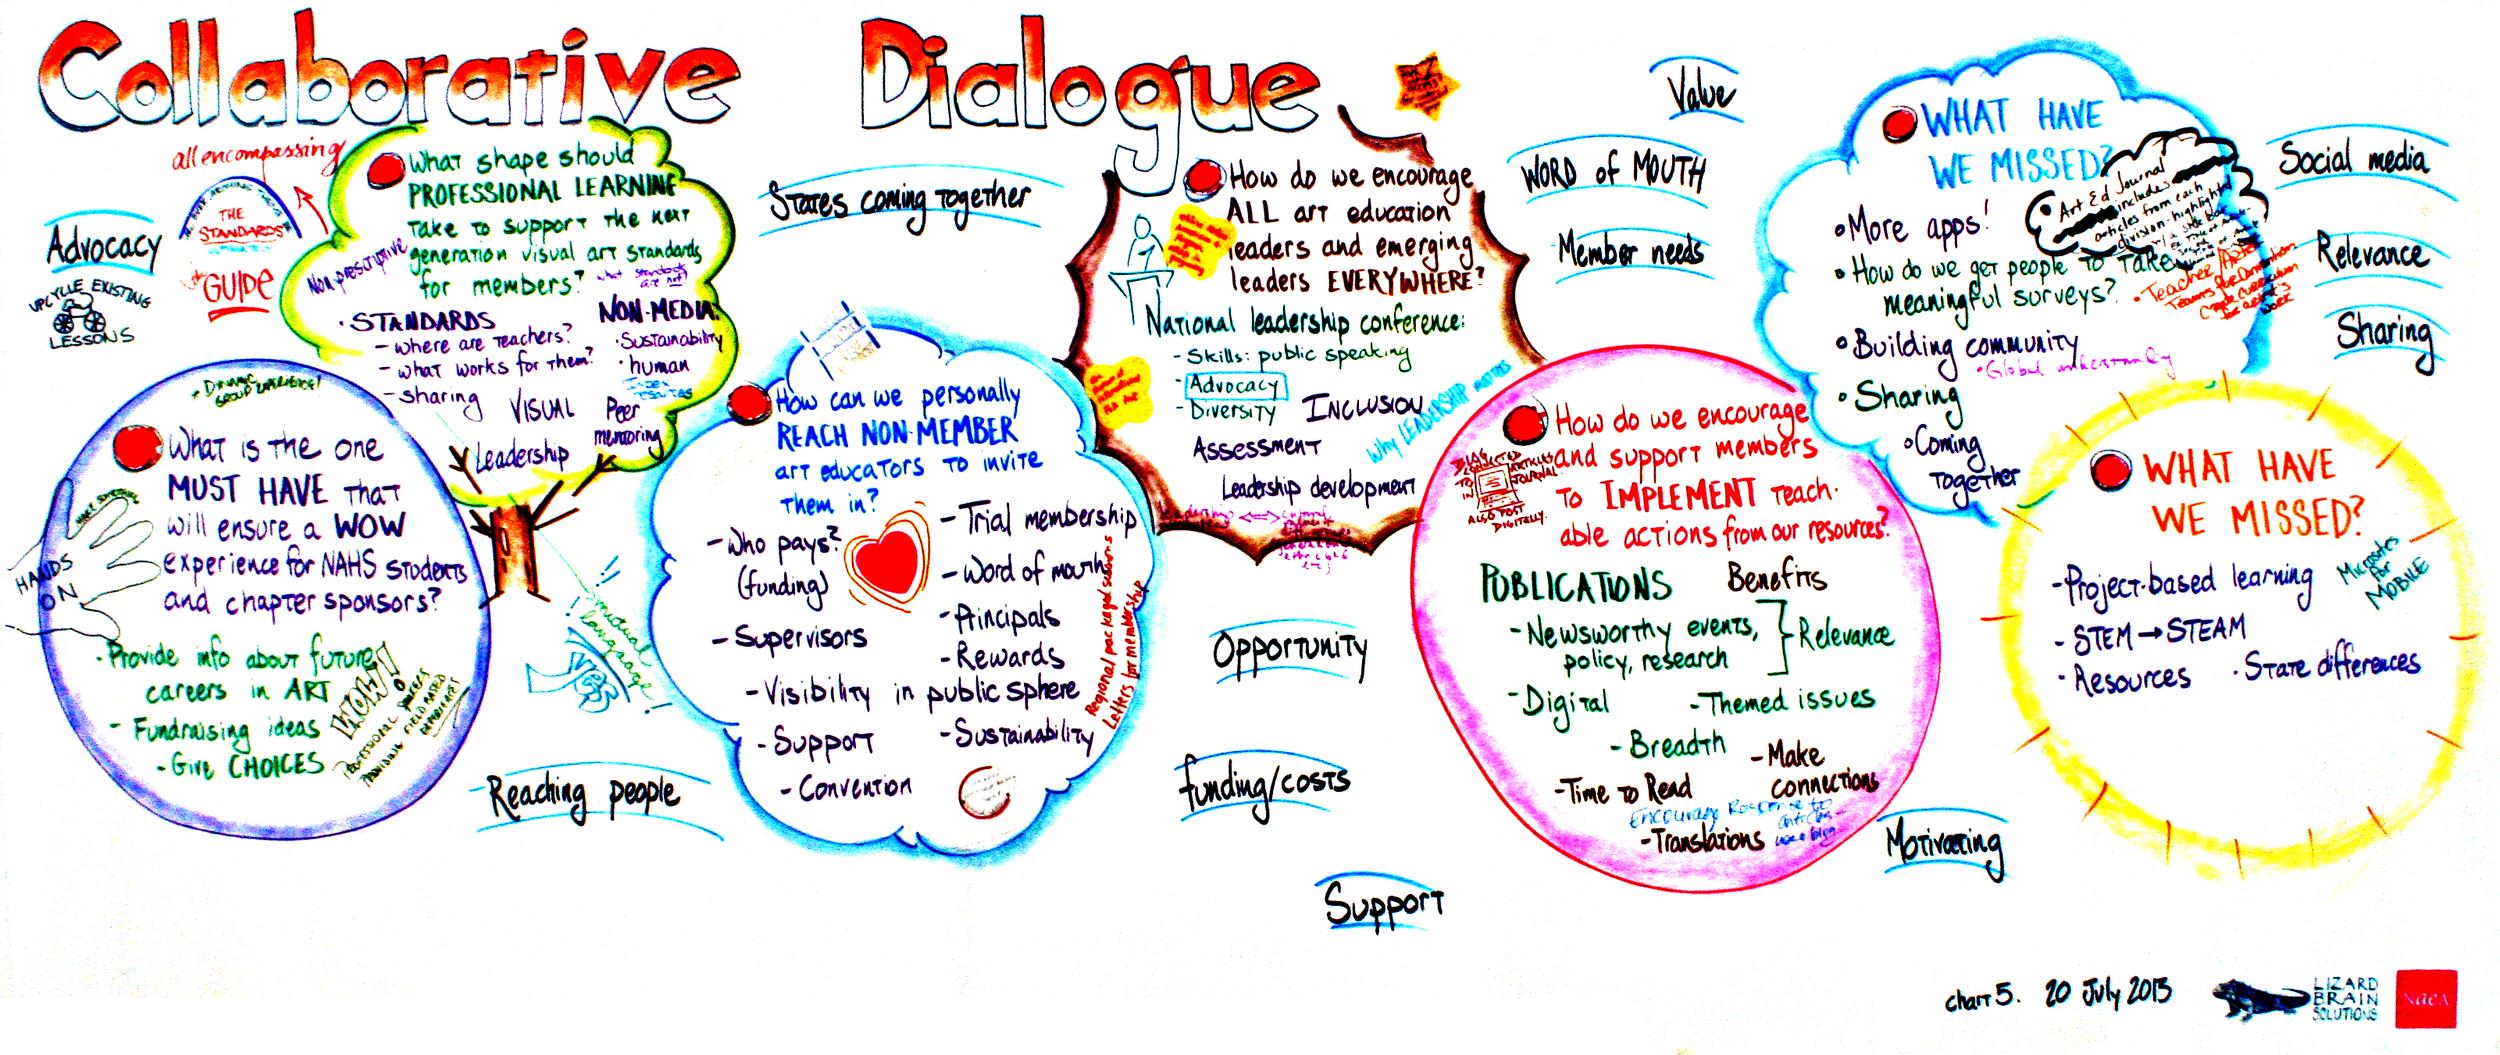 NAEA 20 July 2013 chart 5 Collaborative Dialogue.jpg